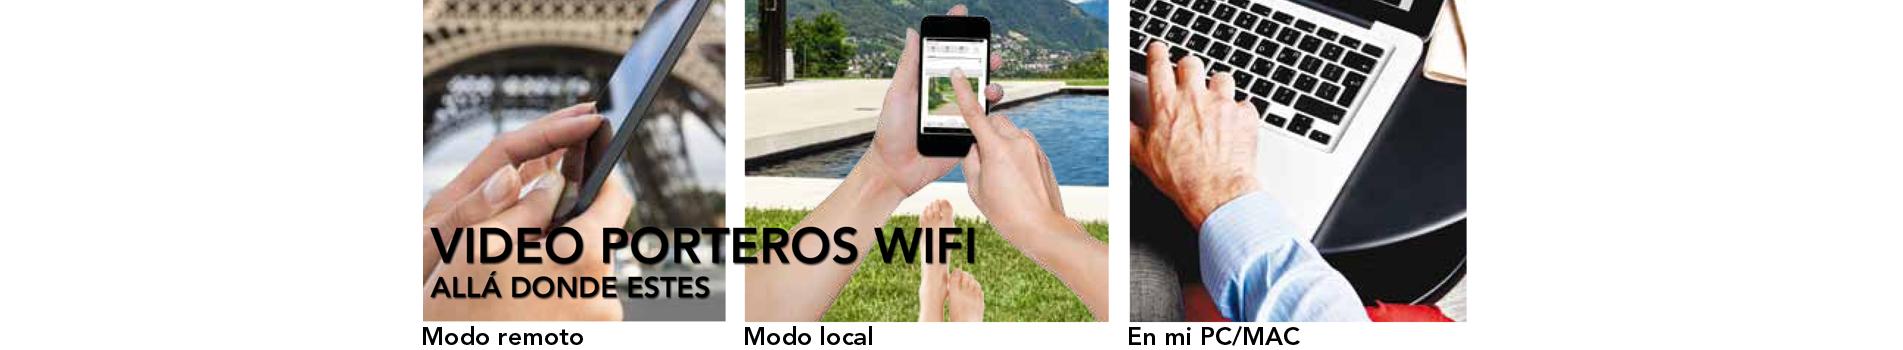 video-porteros-wifi